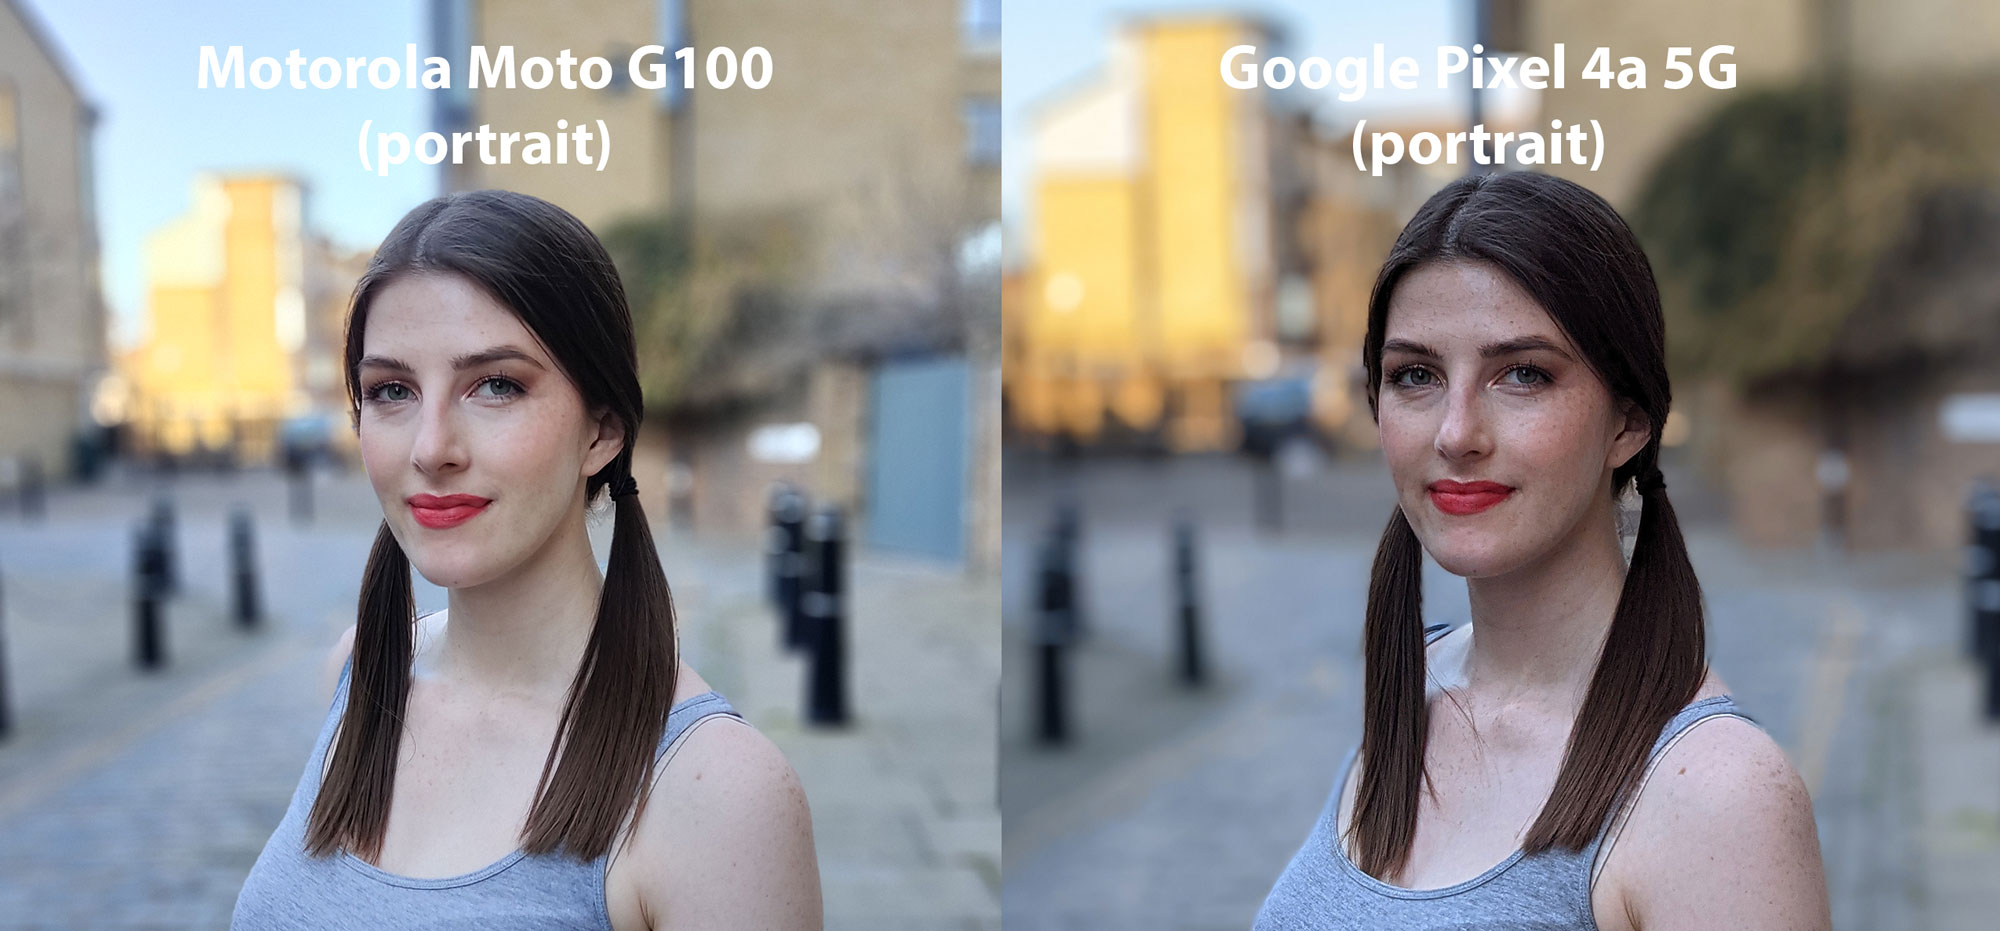 moto-g100-camera-comparison-google-pixel-4a-5g-3.jpg